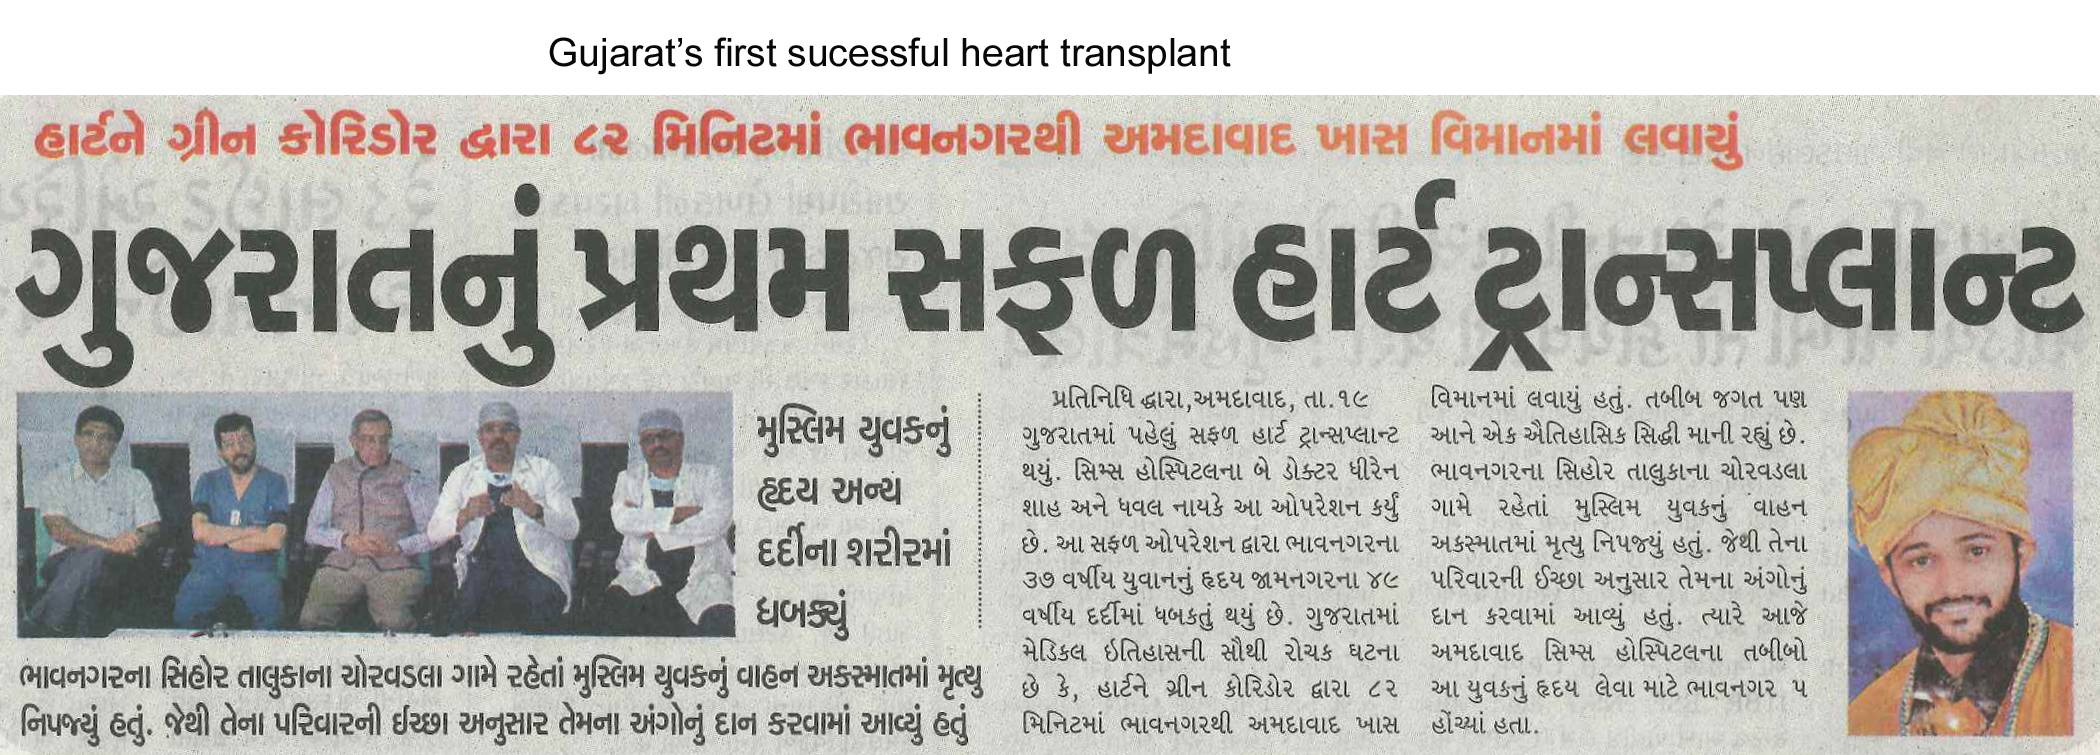 Ahmedabad Express (Ahd) _CIMS (1st Heart transplant in Gujarat)_20.12.16_Pg 12